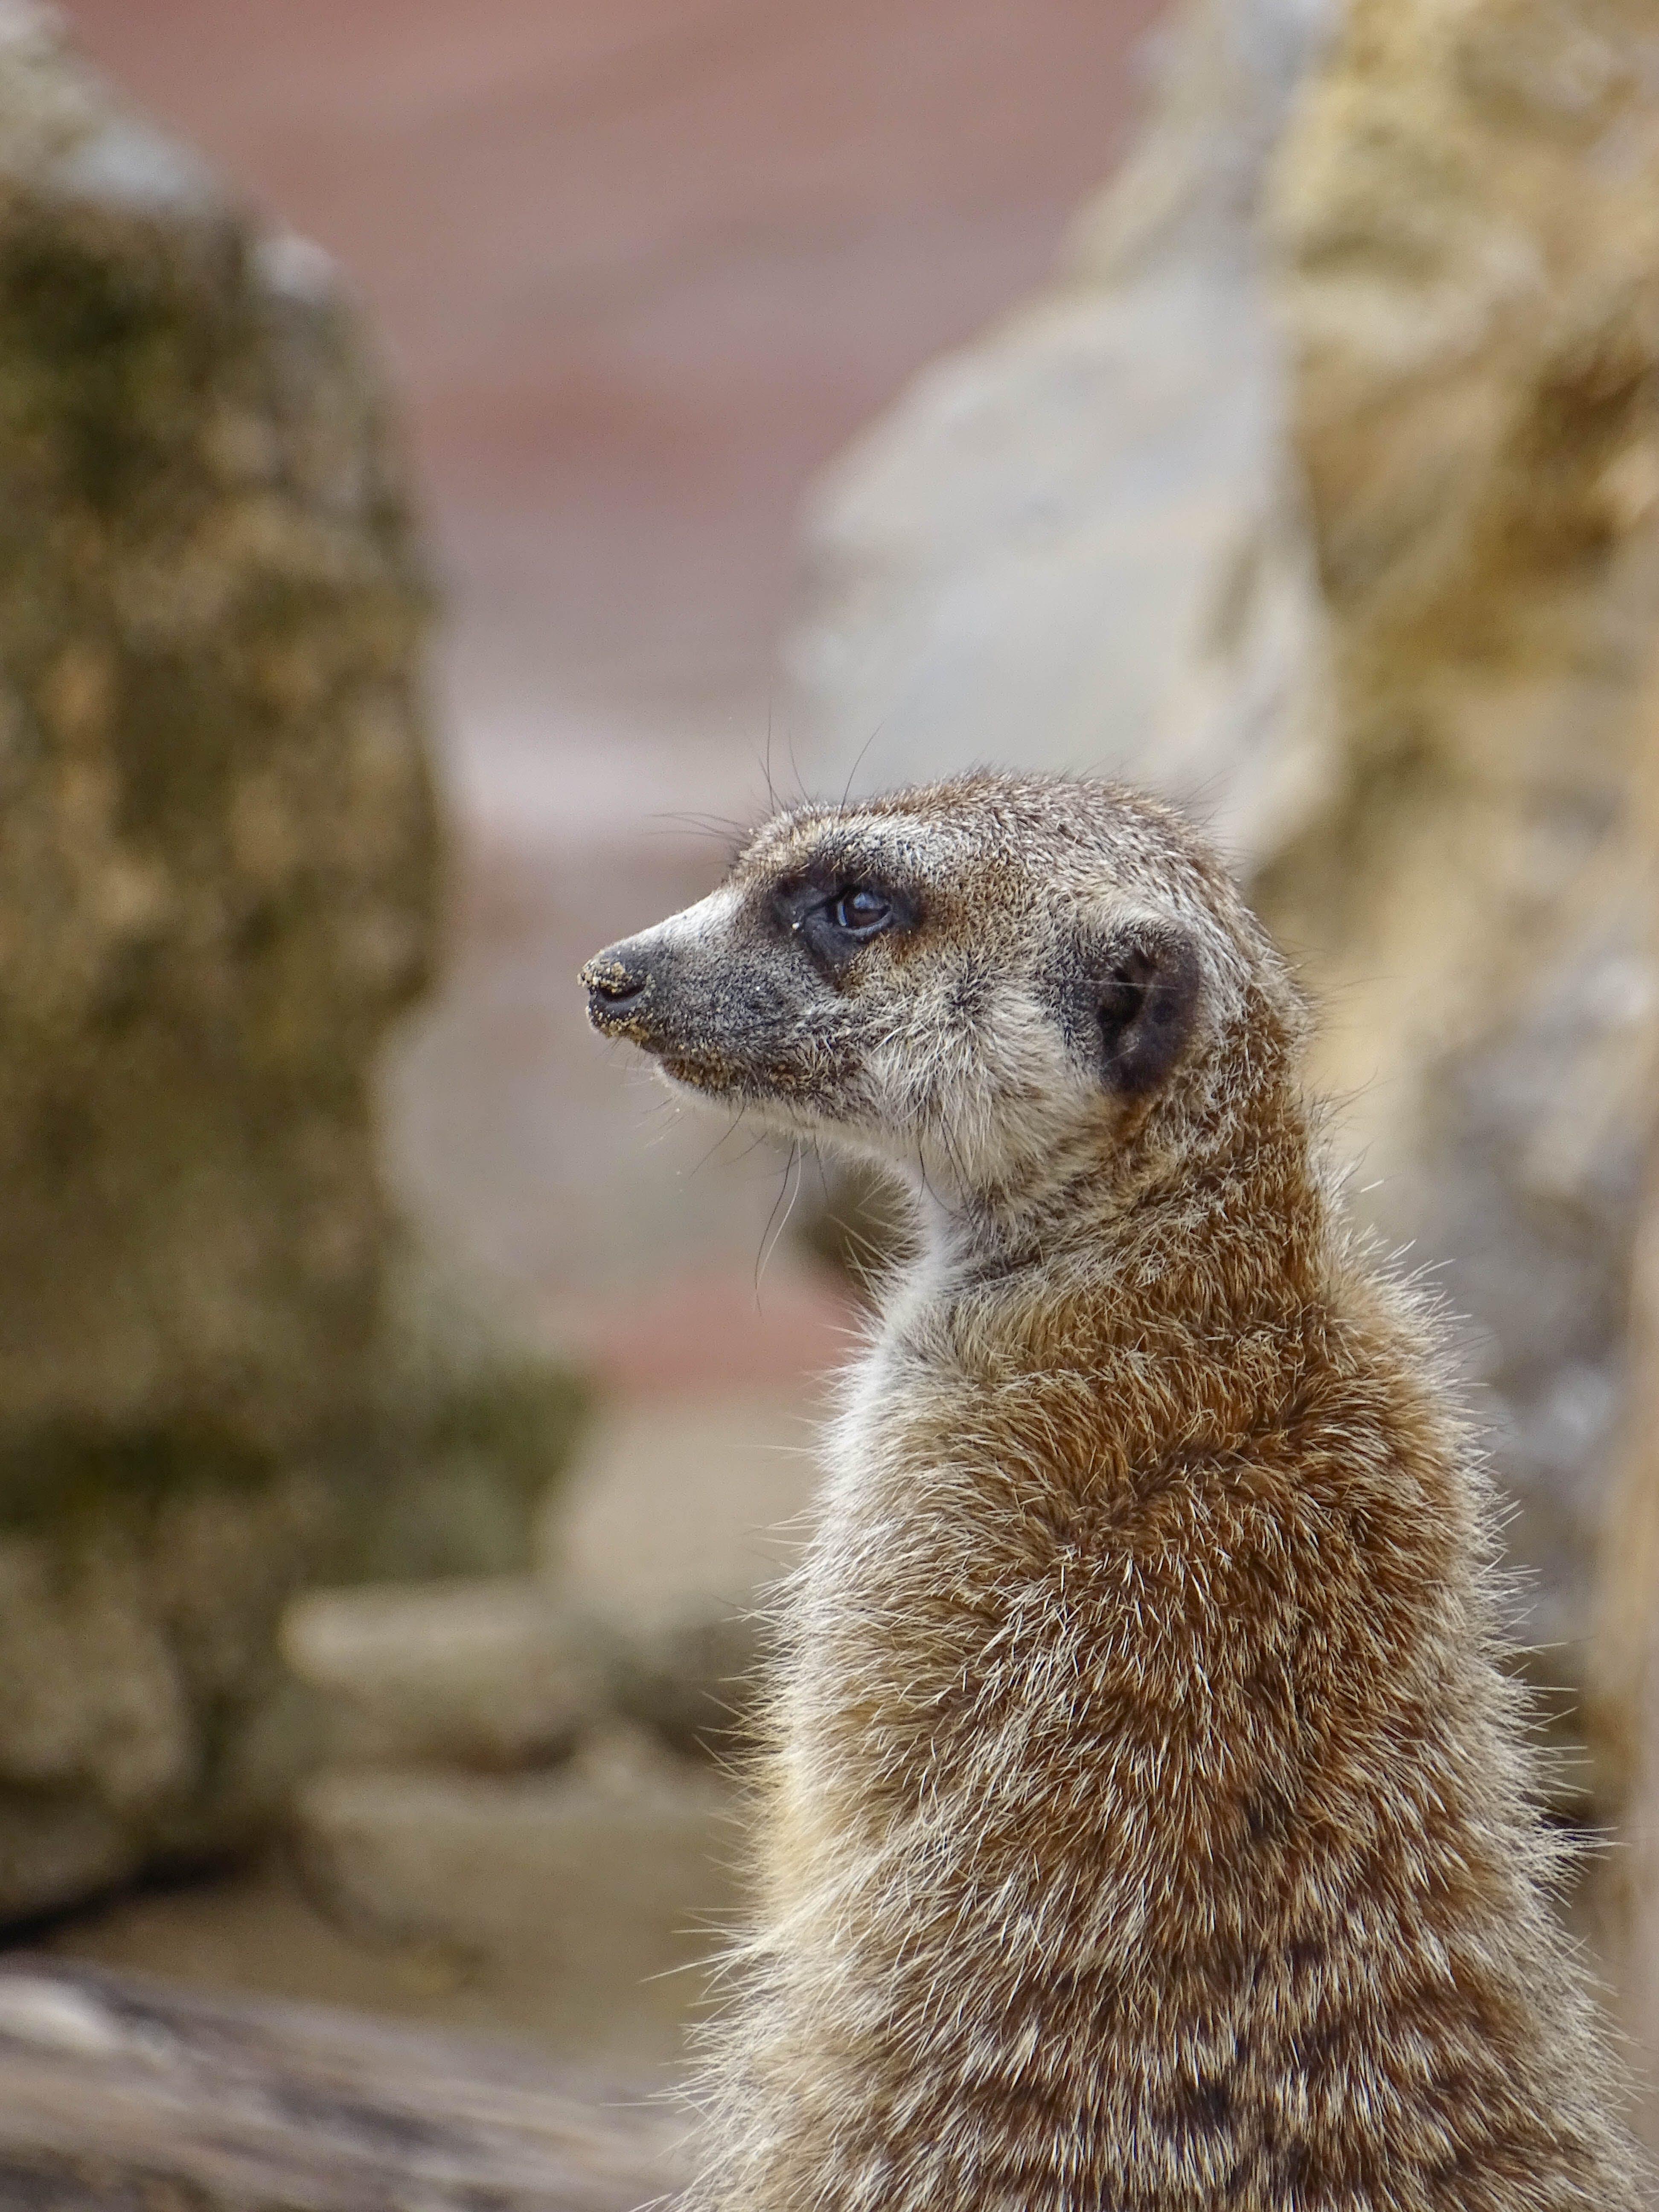 Základová fotografie zdarma na téma roztomilá zvířátka, roztomilý, surikata, zoo